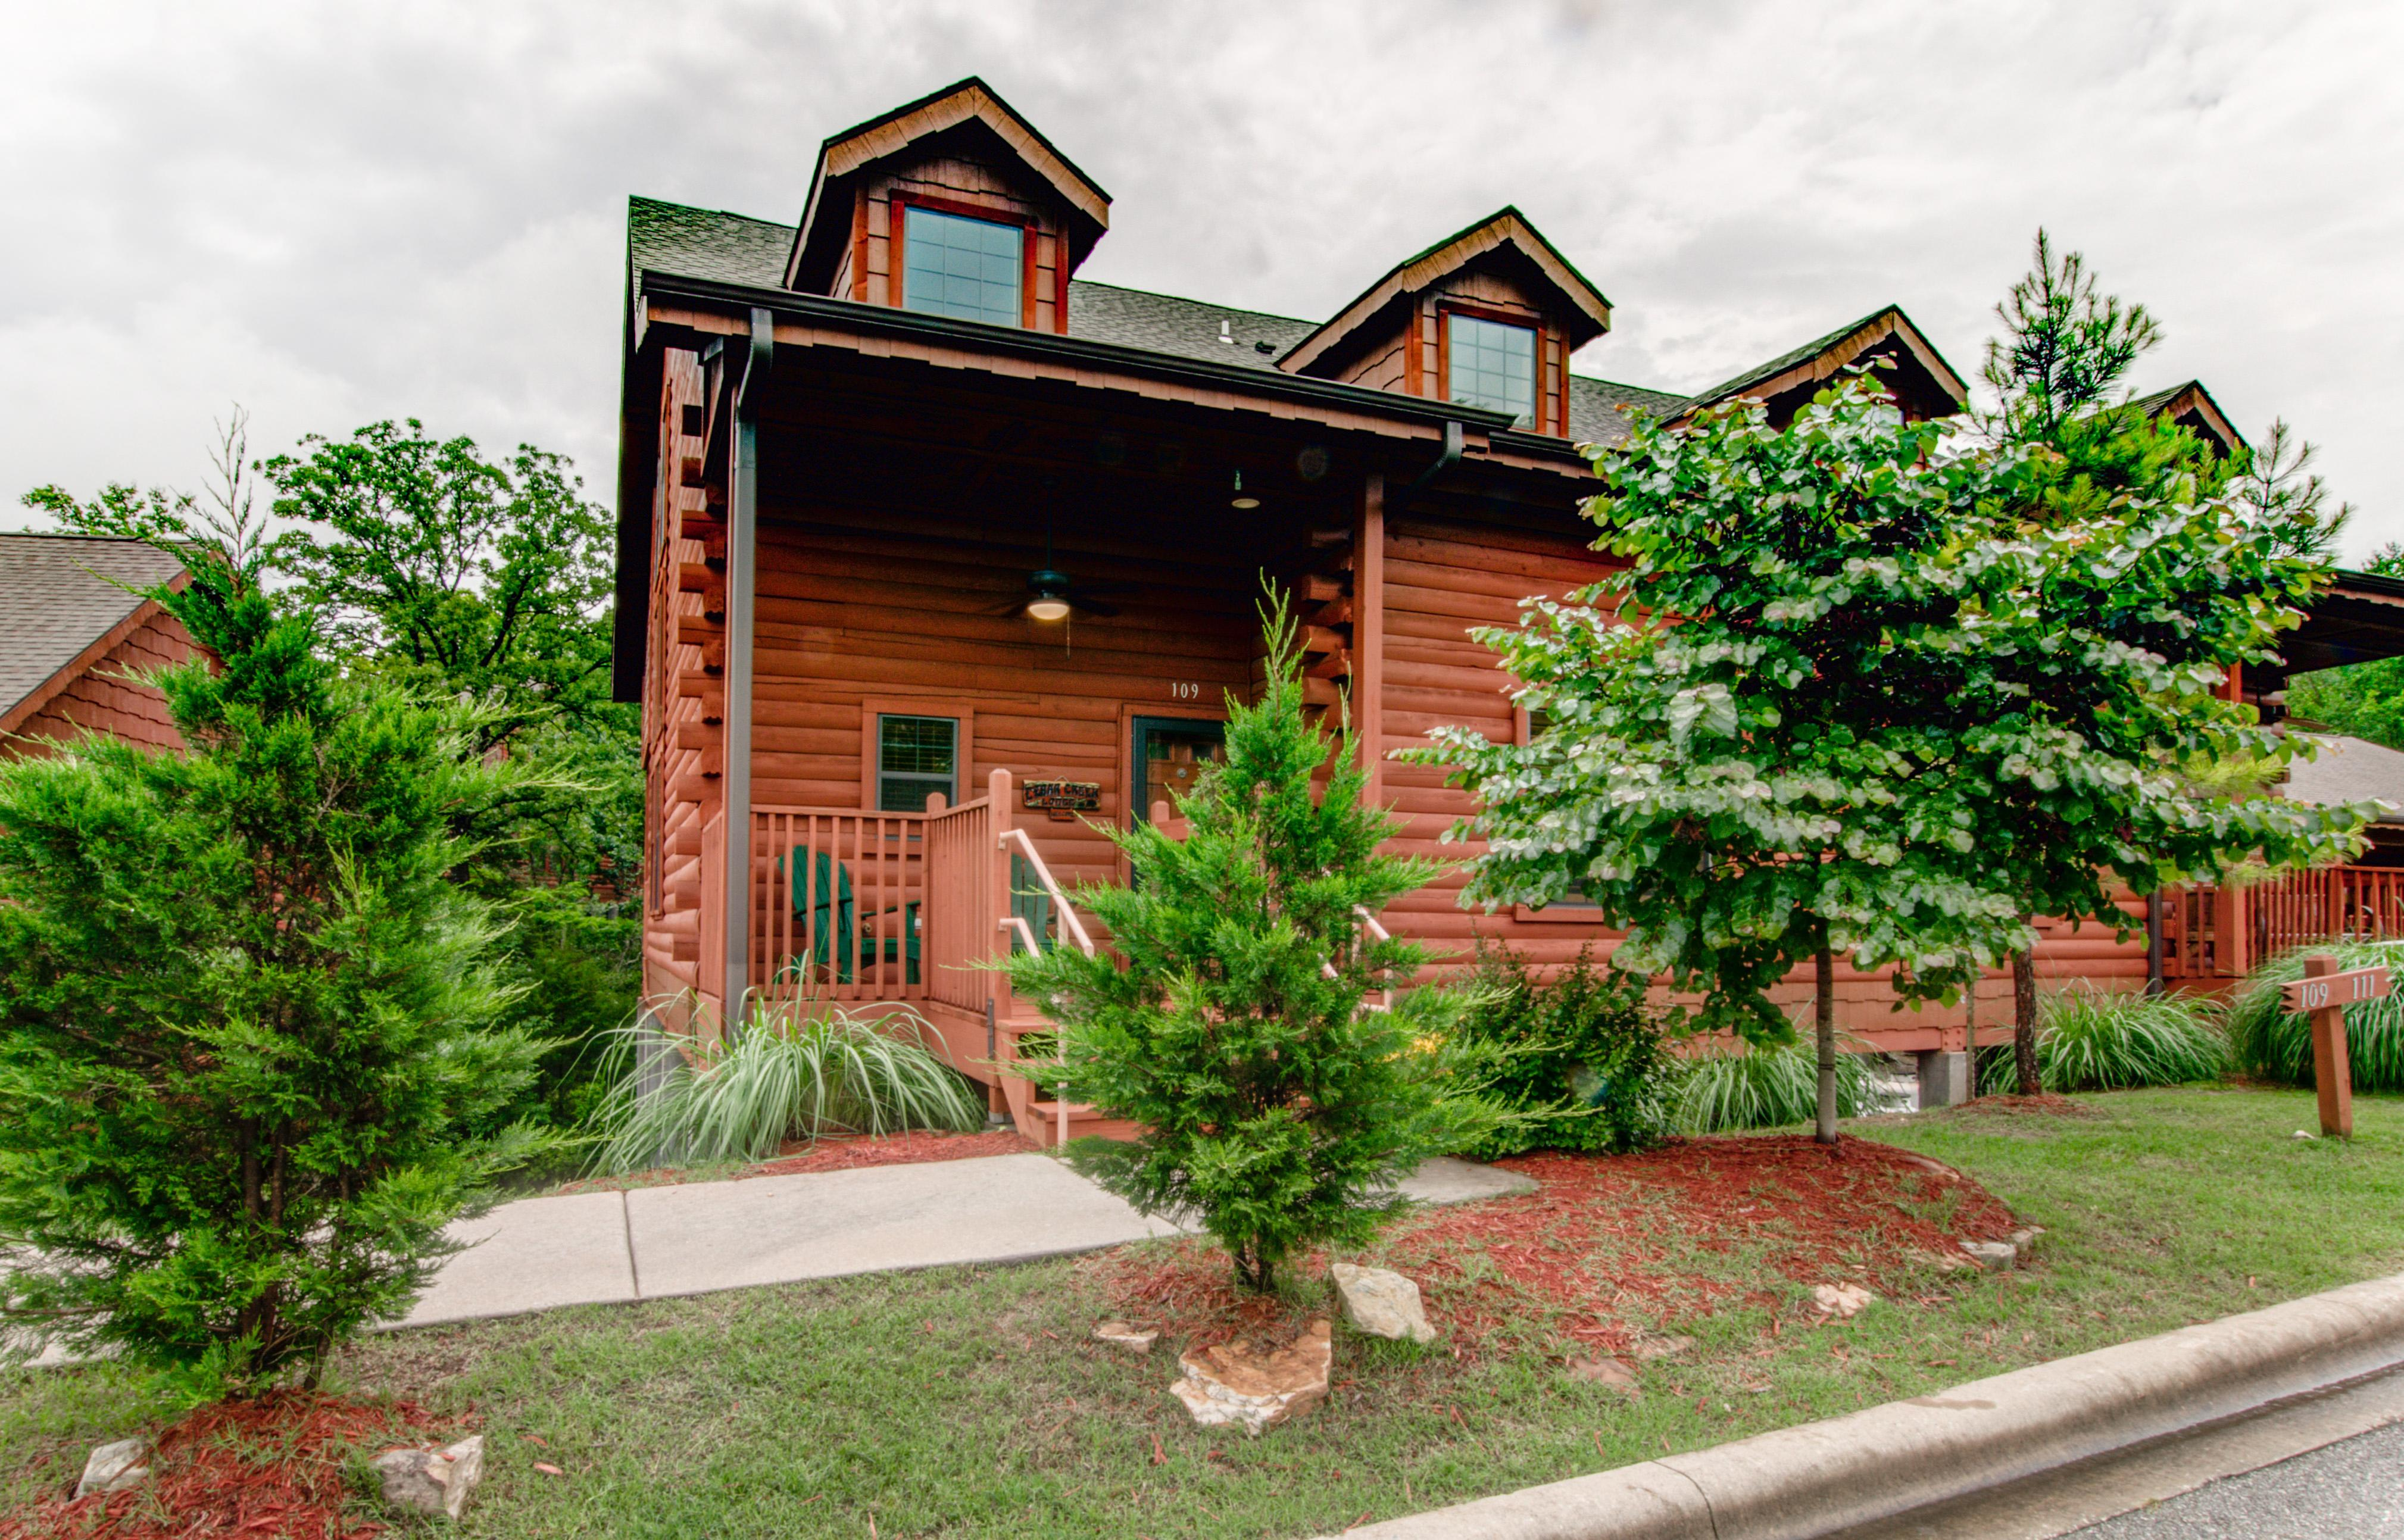 Cedar creek lodge rent your lodge for Cedar creek